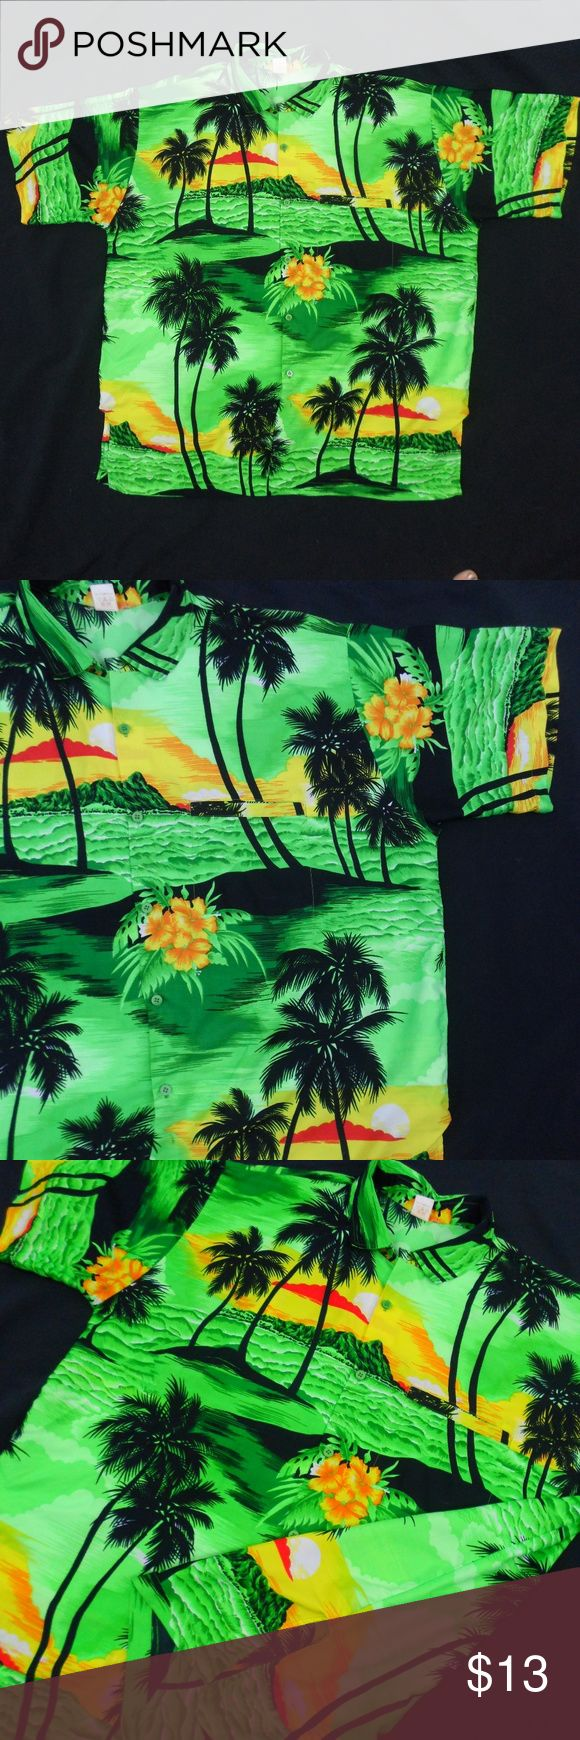 Lime Green Hawaiian Shirt Rima  Lime Green-Hawaiian Shirt-Lime Green-Short Sleeve-Button Down-100% Terivoile  Size: Extra Large  ***Small Black Stain Near Bottom Hem Of Shirt(SEE PHOTO)*** Rima Shirts Casual Button Down Shirts